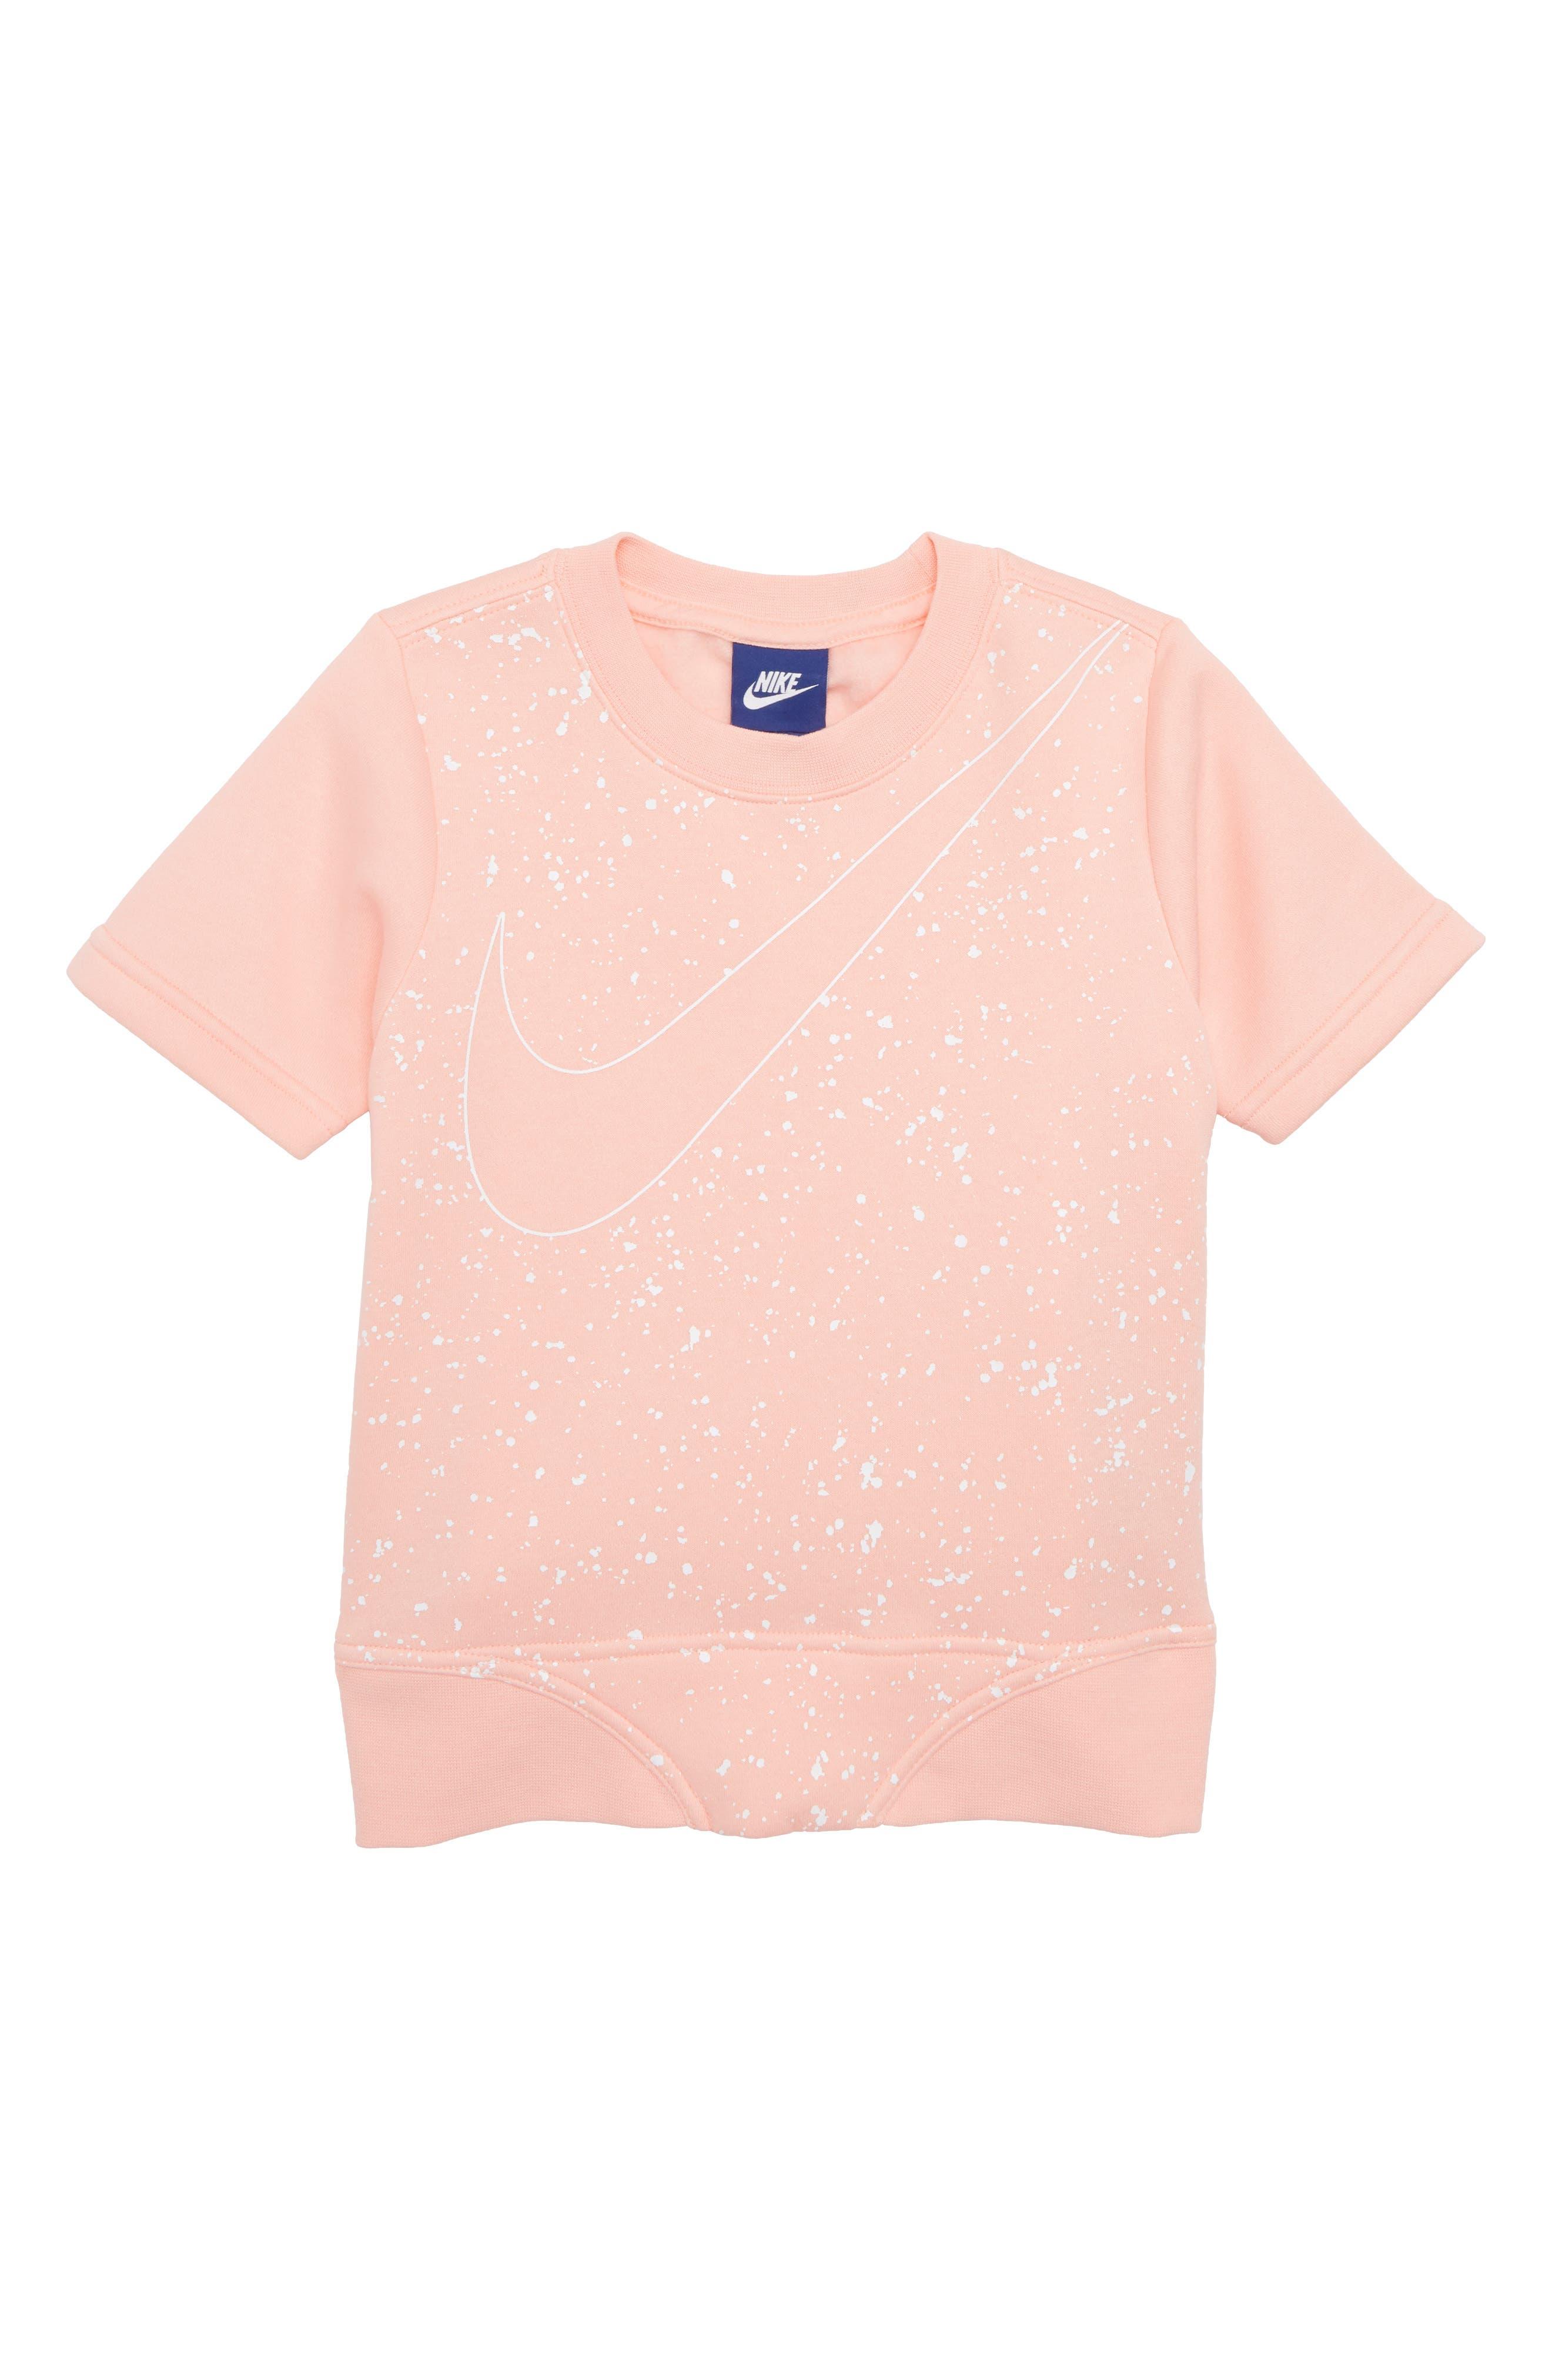 Sportswear Short Sleeve Sweatshirt,                         Main,                         color, Bleached Coral/ White